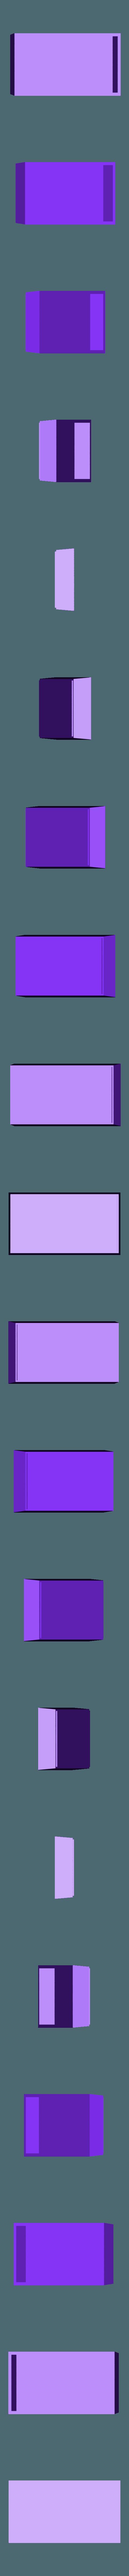 rangements-simples_empilables.stl Download free STL file Stackable storage • 3D print object, Zerack